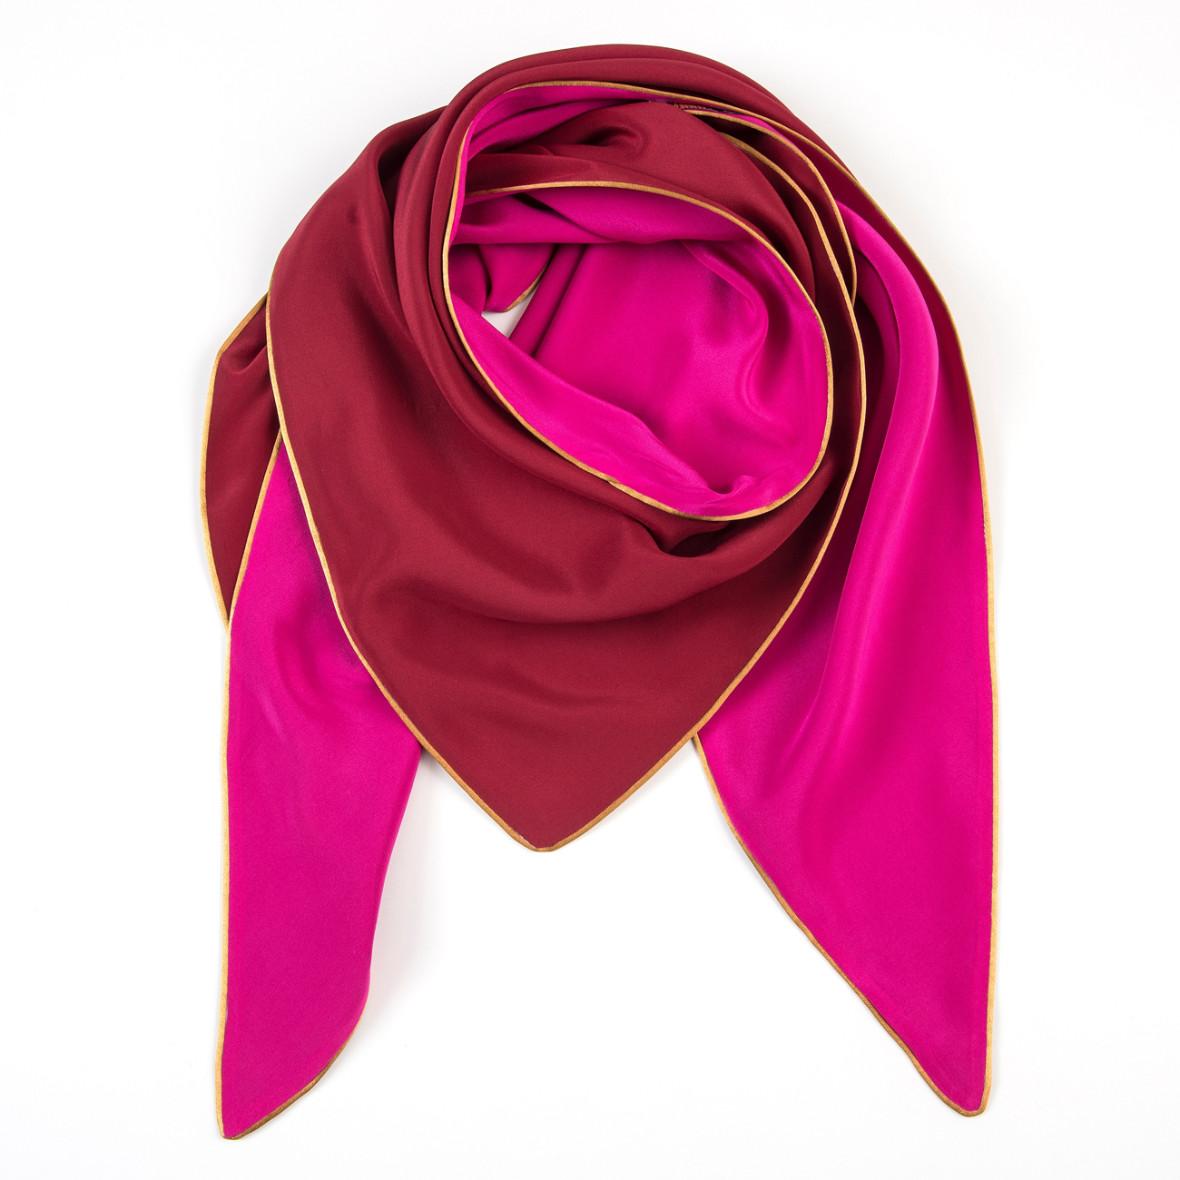 dreieckschal moitié carré in pink bordeaux